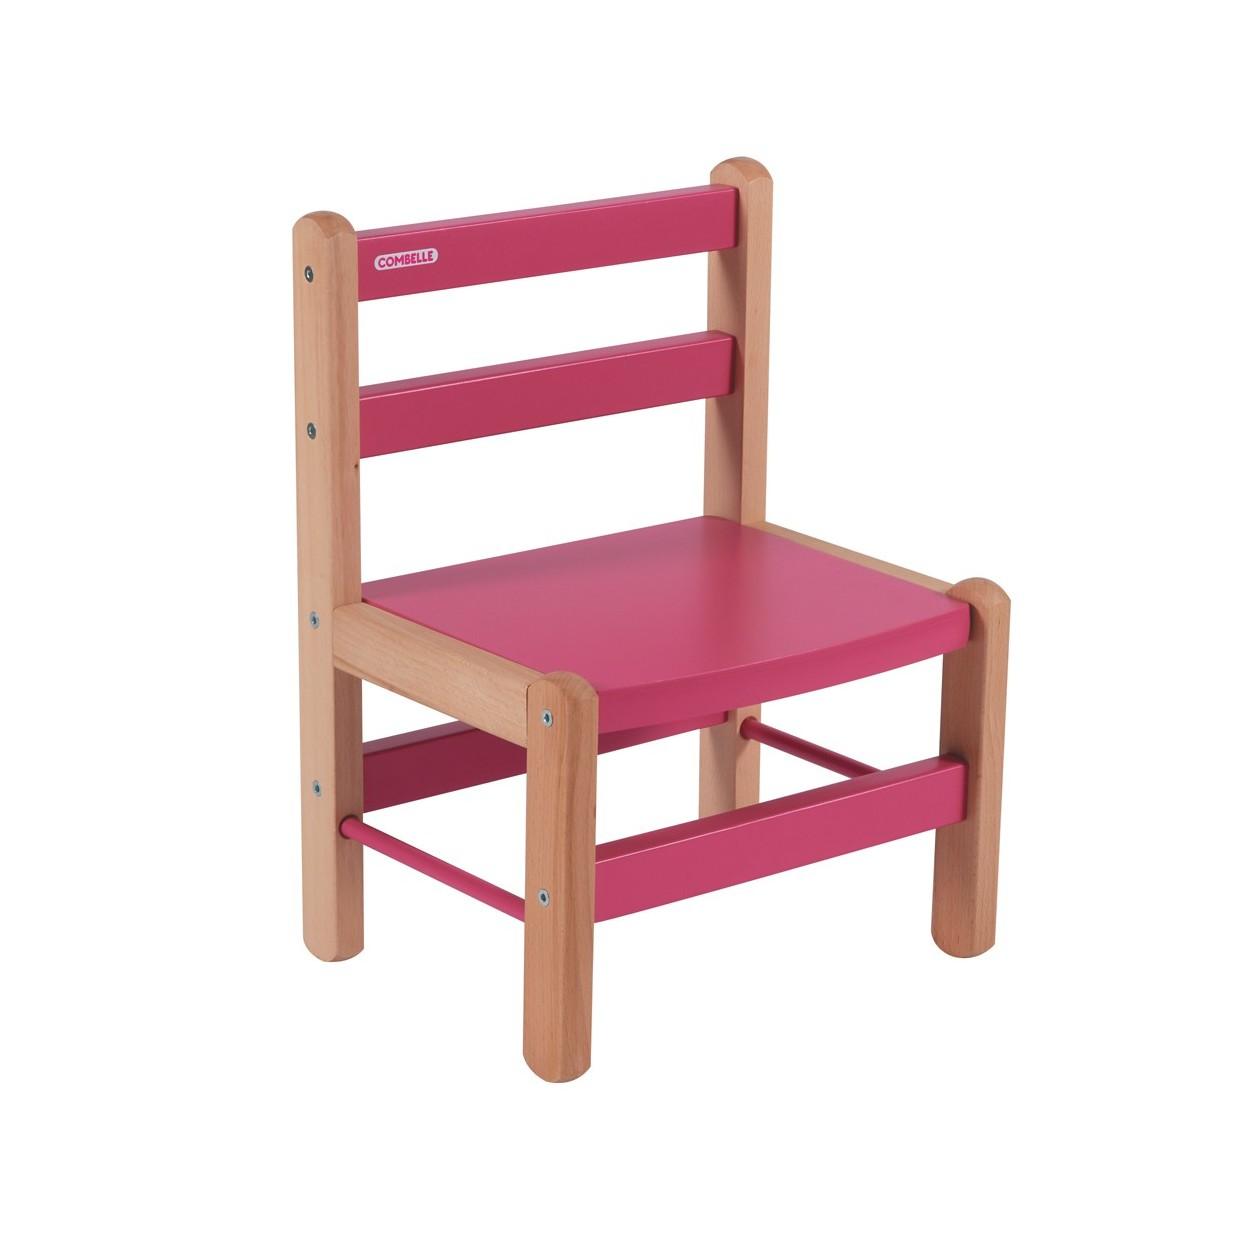 Chaise enfant bicolore fuchsia - 33x46x27 cm